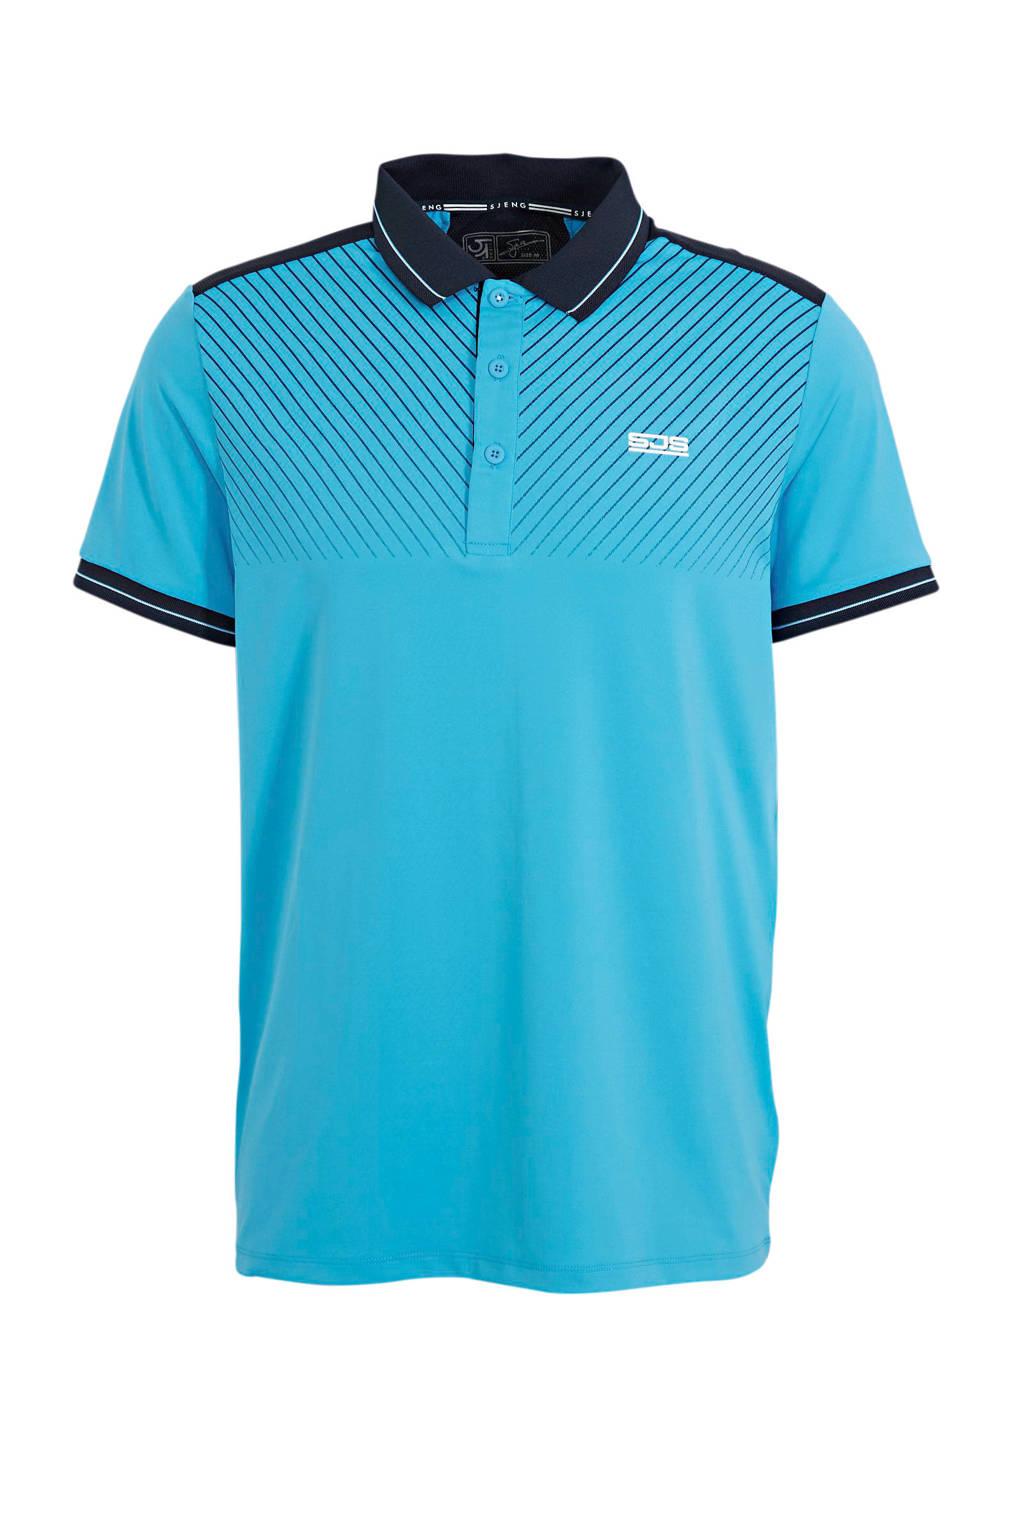 Sjeng Sports   polo blauw/donkerblauw, Blauw/donkerblauw